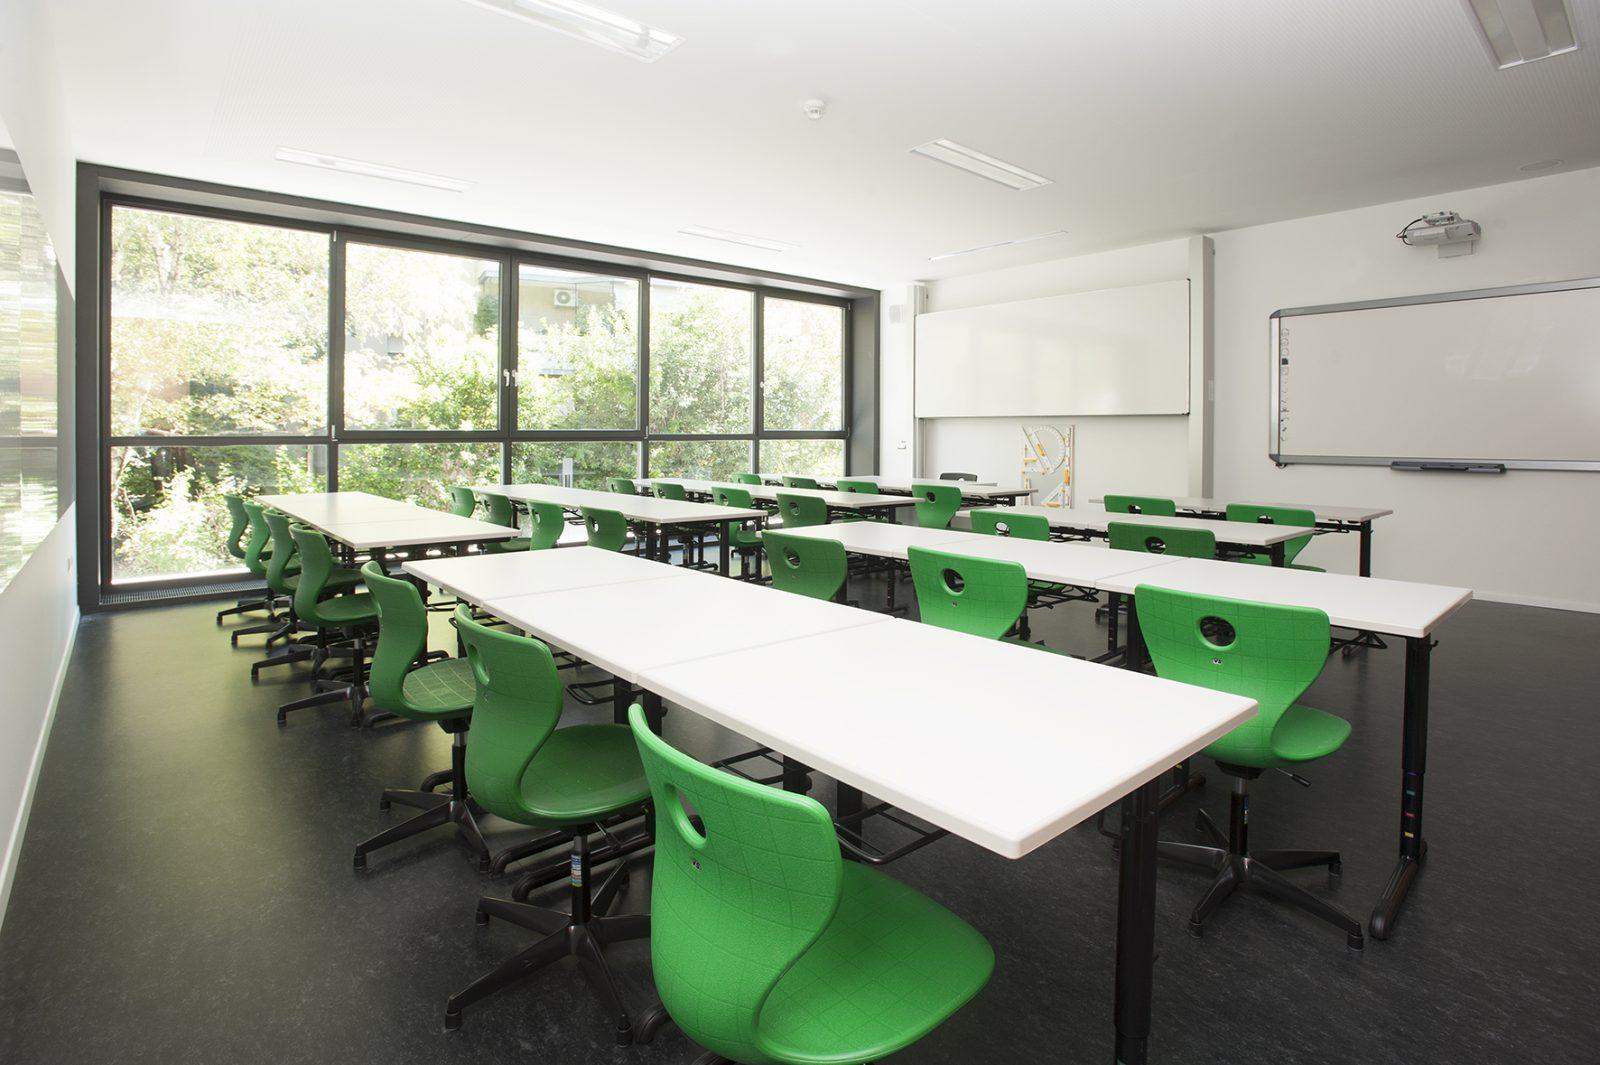 Gymnasium G. Carducci, Bozen